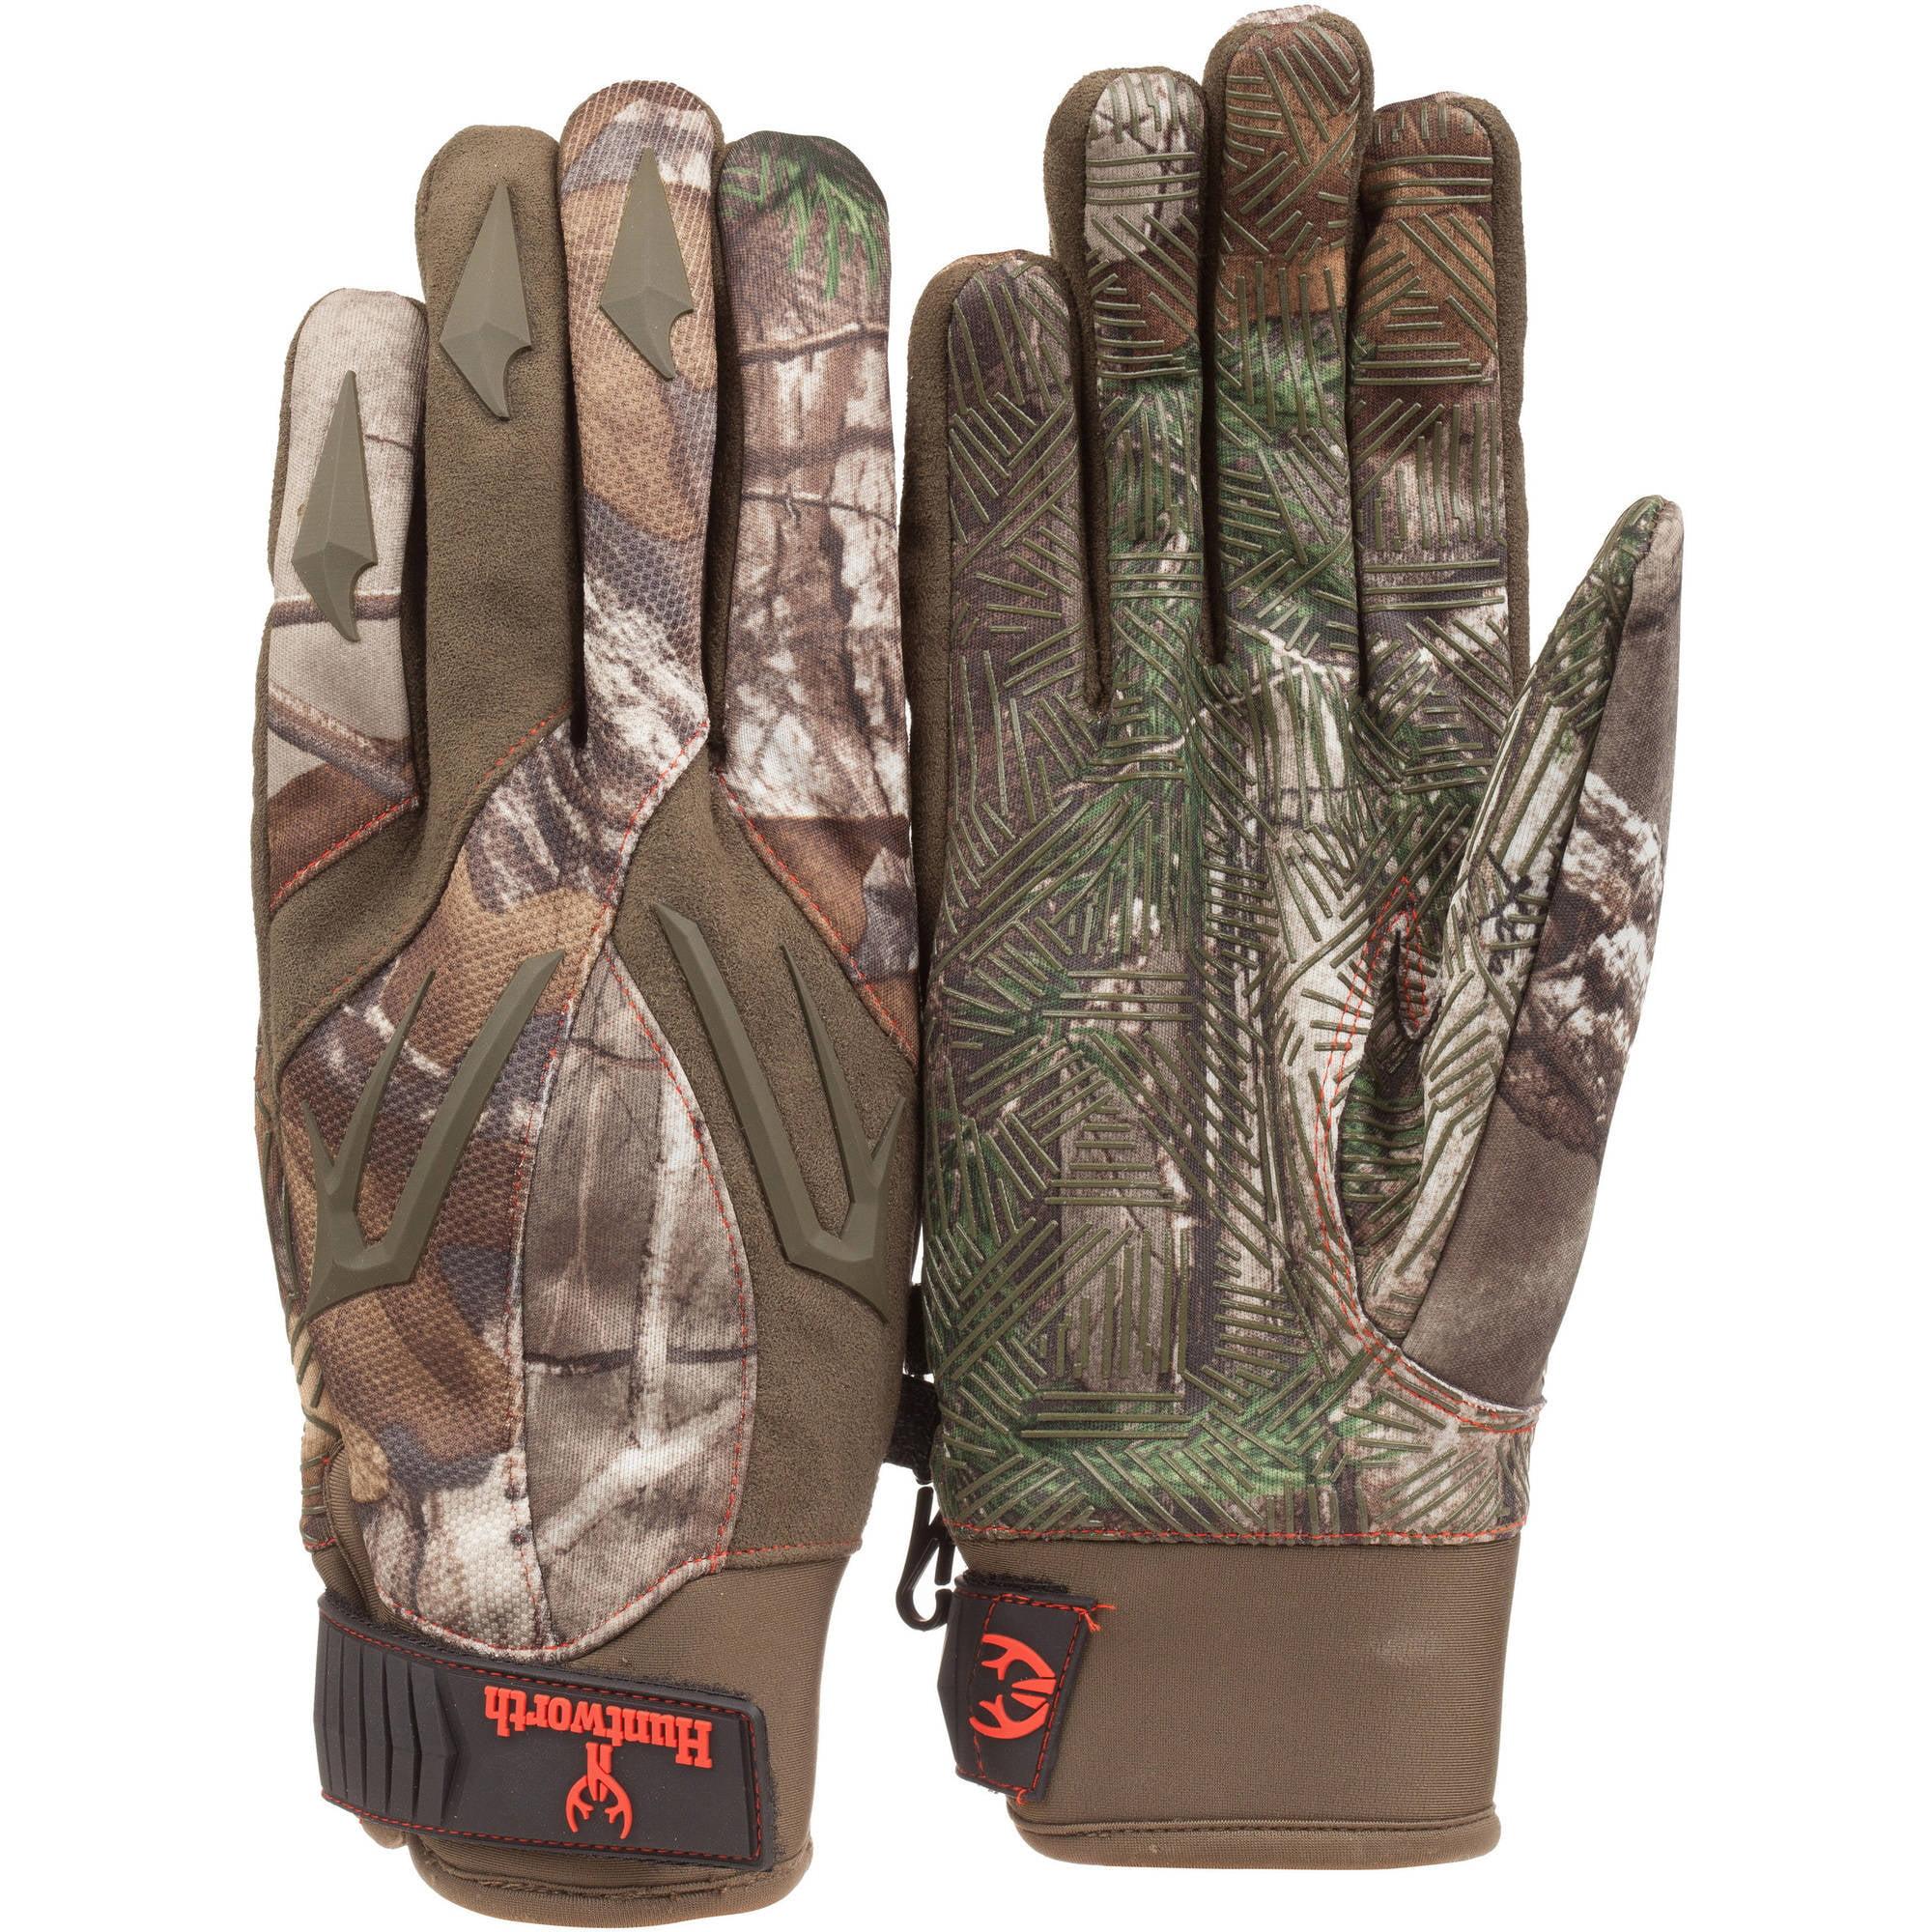 Marksman Tri-Laminate Hunting Gloves